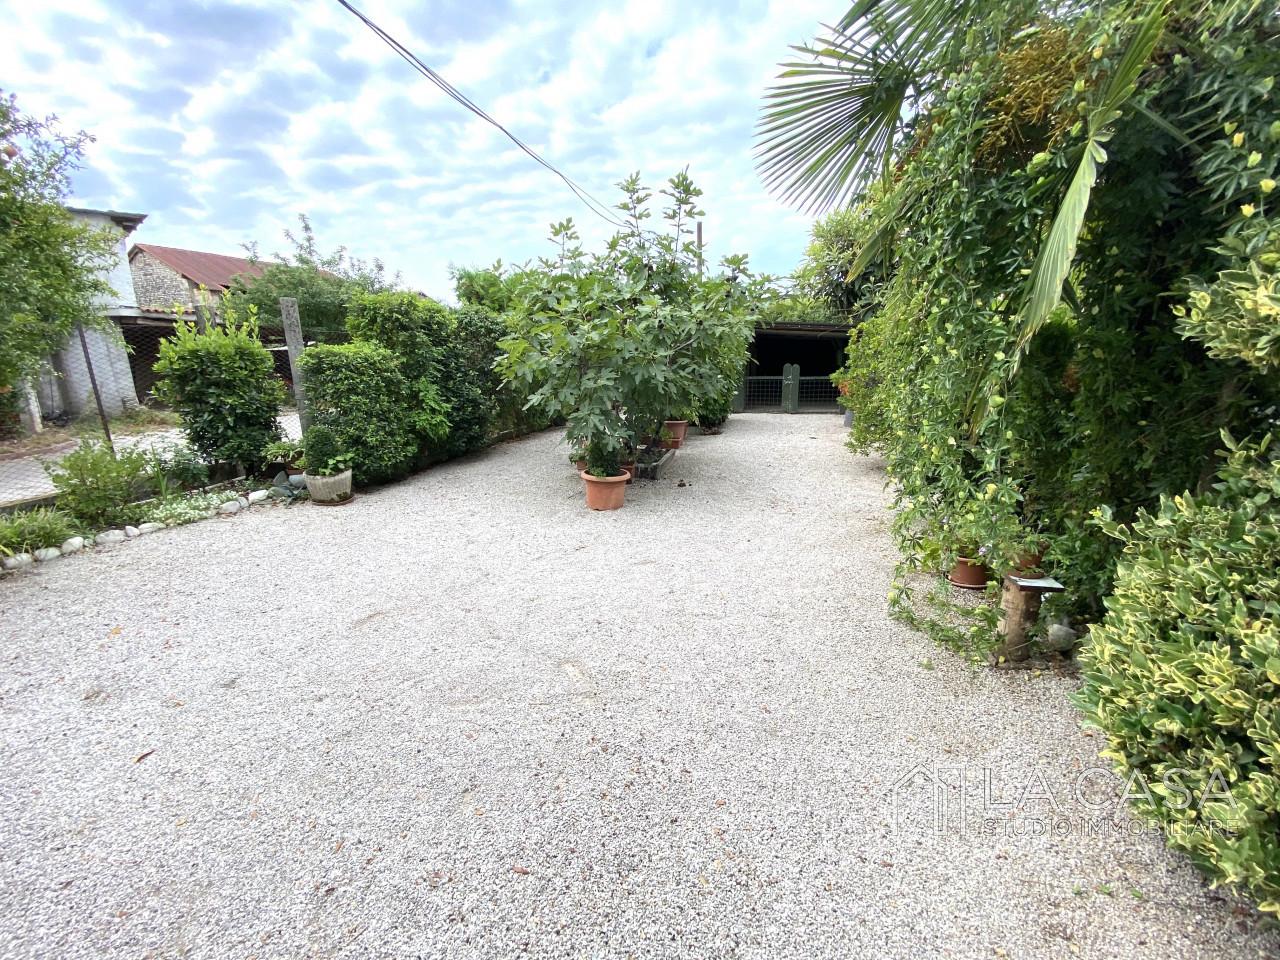 Palazzo plurifamiliare in vendita a Valvasone Arzene - Rif. P3 https://images.gestionaleimmobiliare.it/foto/annunci/200827/2284141/1280x1280/025__img_3739_wmk_0.jpg